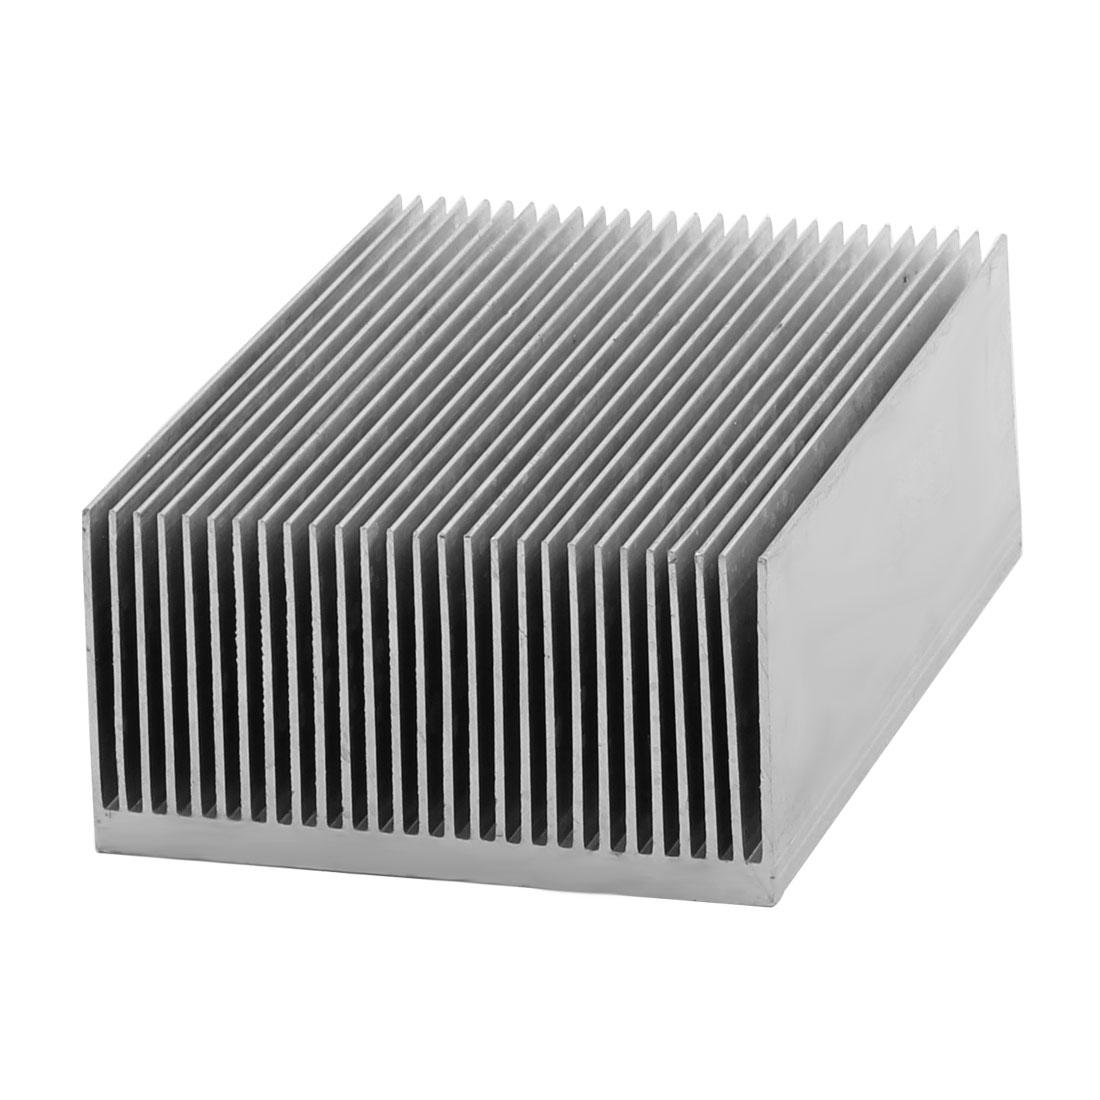 Aluminium Heatsink Heat Diffuse Dissipate Cooling Fin Silver Tone 100 x 69 x 36mm